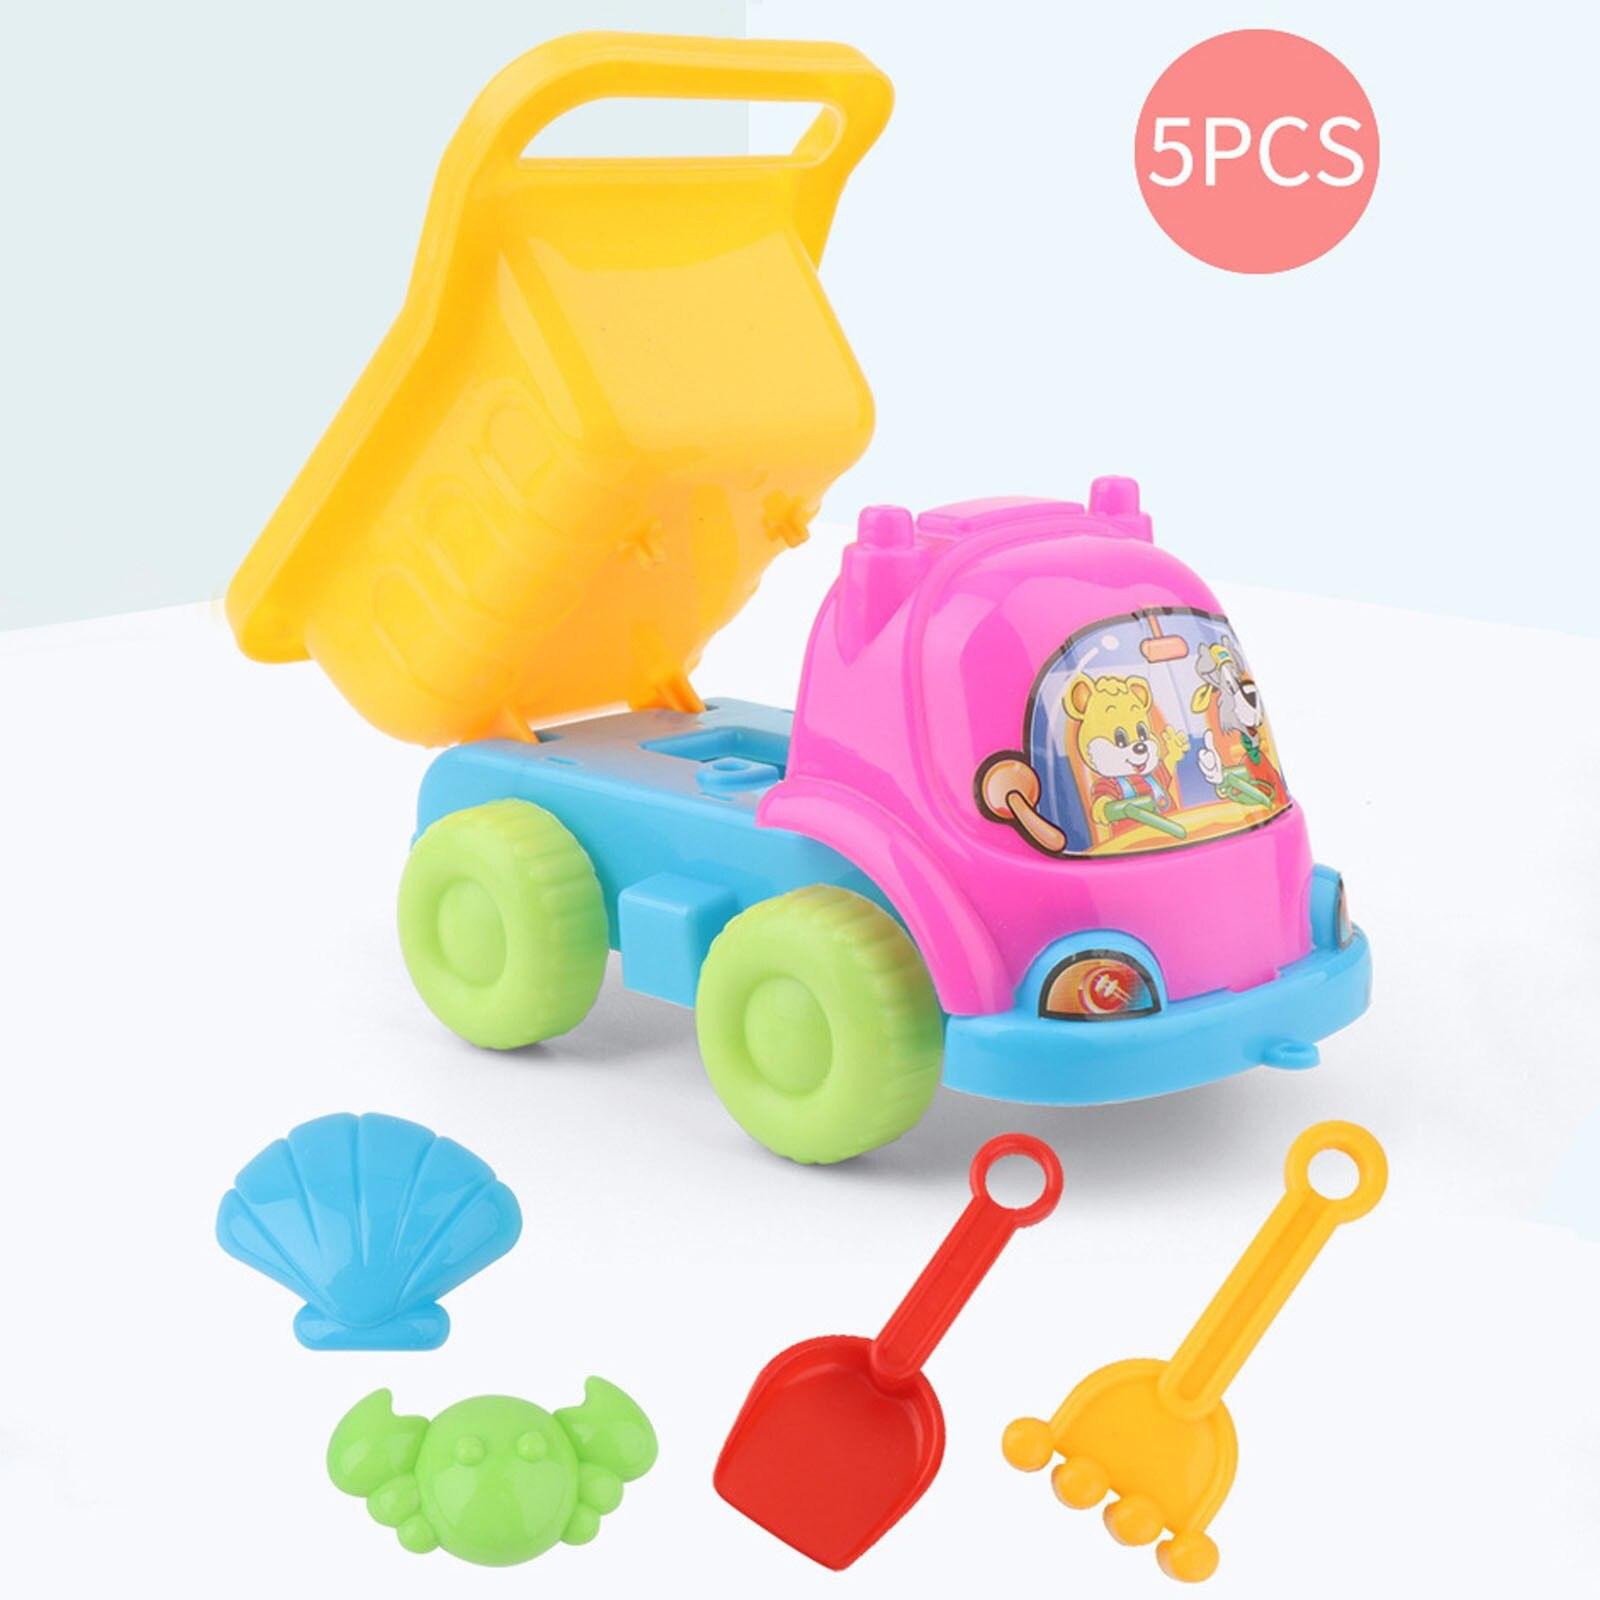 5 Pcs Beach Toy Sand Set Sand Play Sandpit Toy Summer Outdoor Toy Children Sandbox Set Kit Summer Toy For Beach Play Sand Water